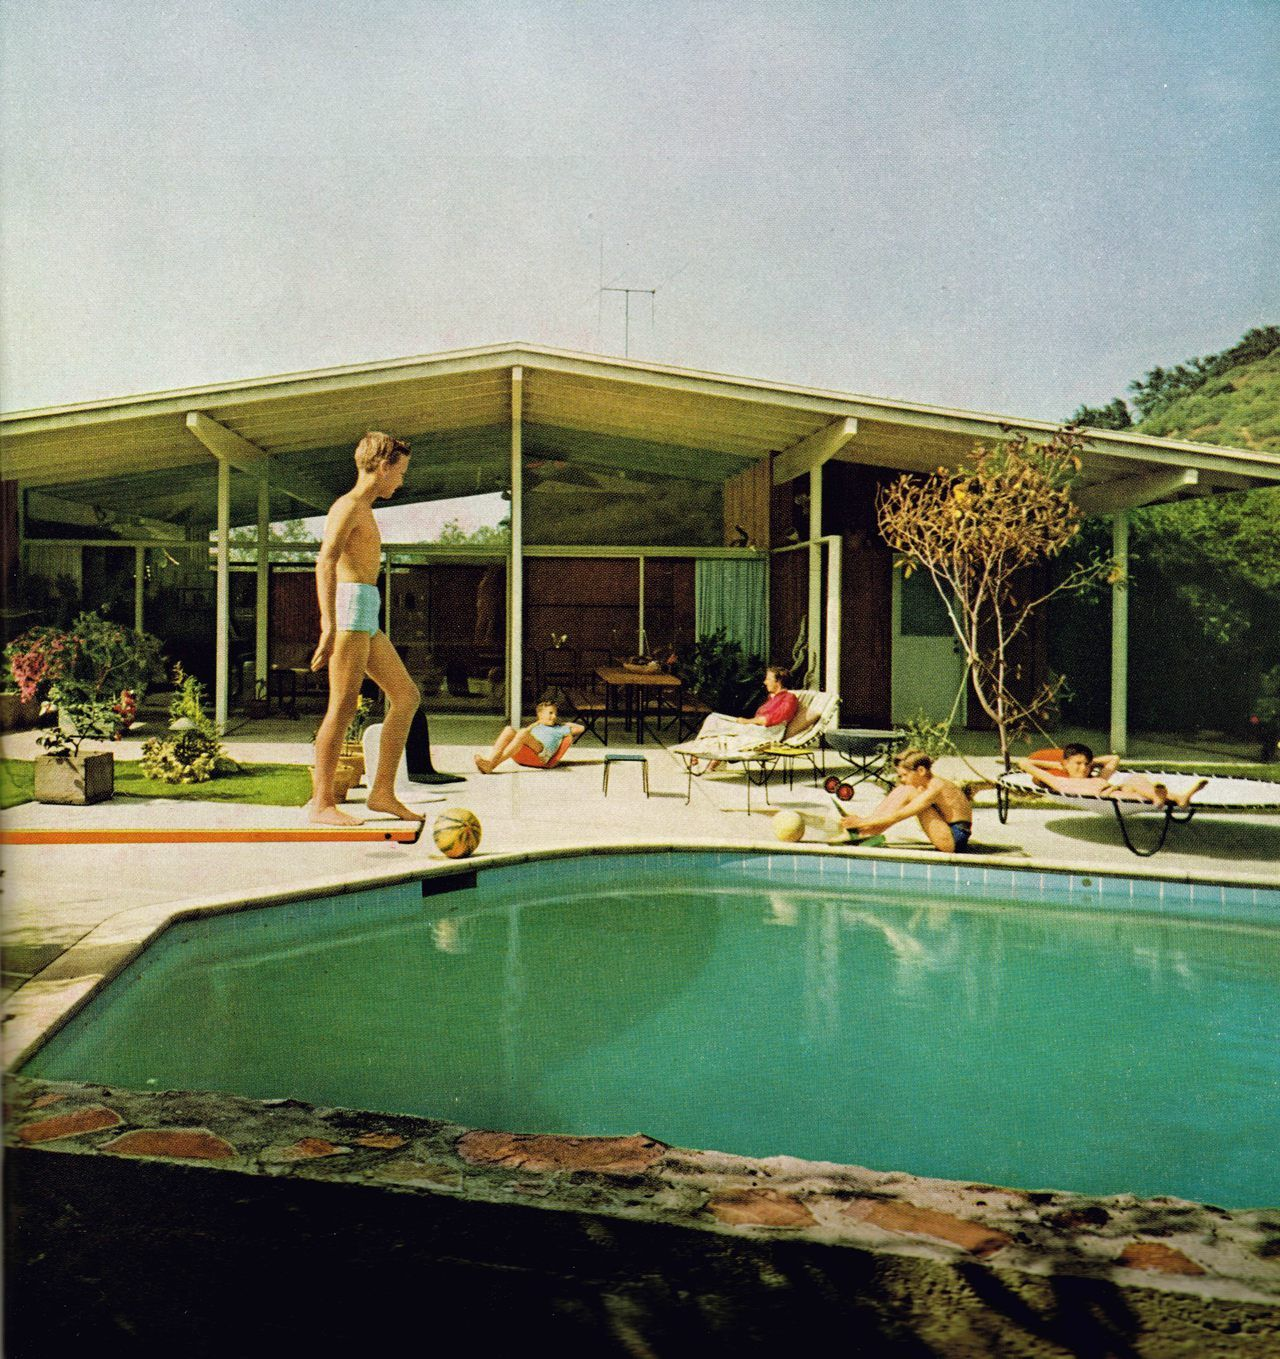 California mid century modern house with backyard pool 1955